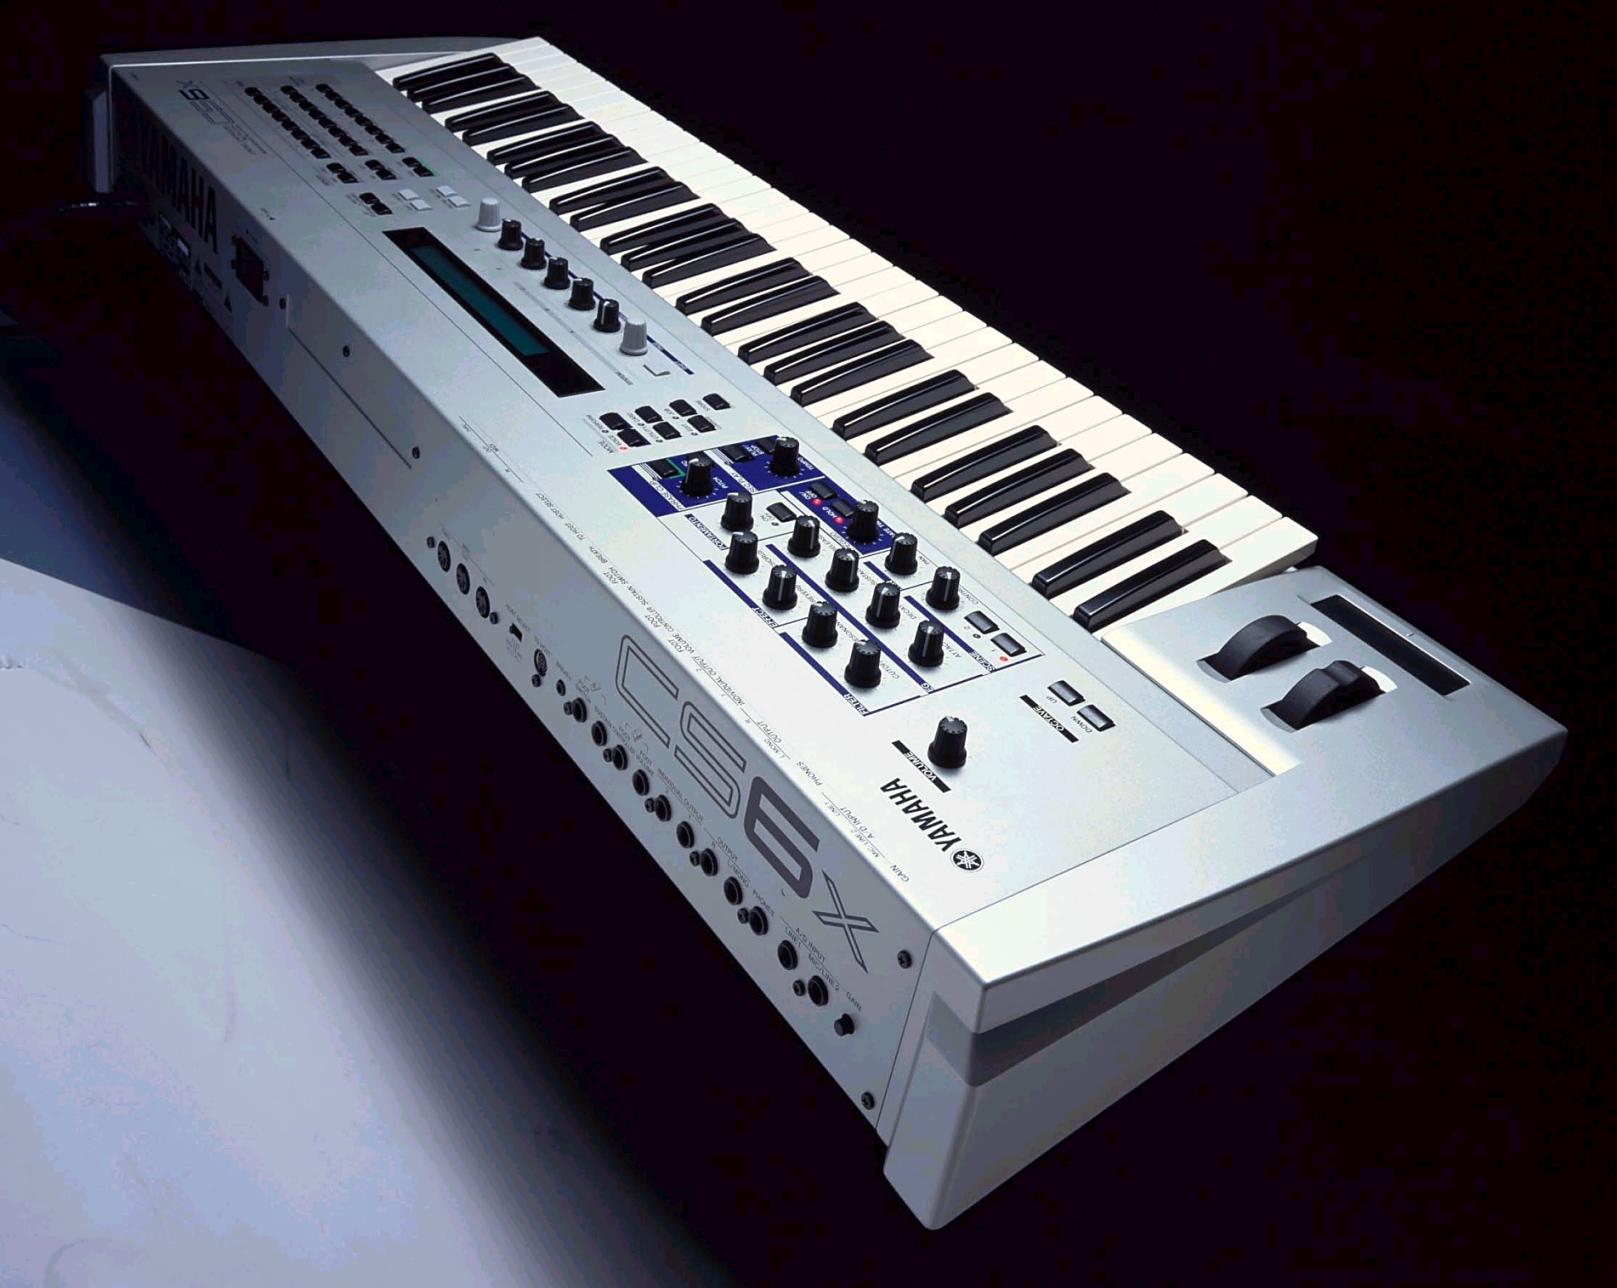 Yamaha Cs Series Synthesizers